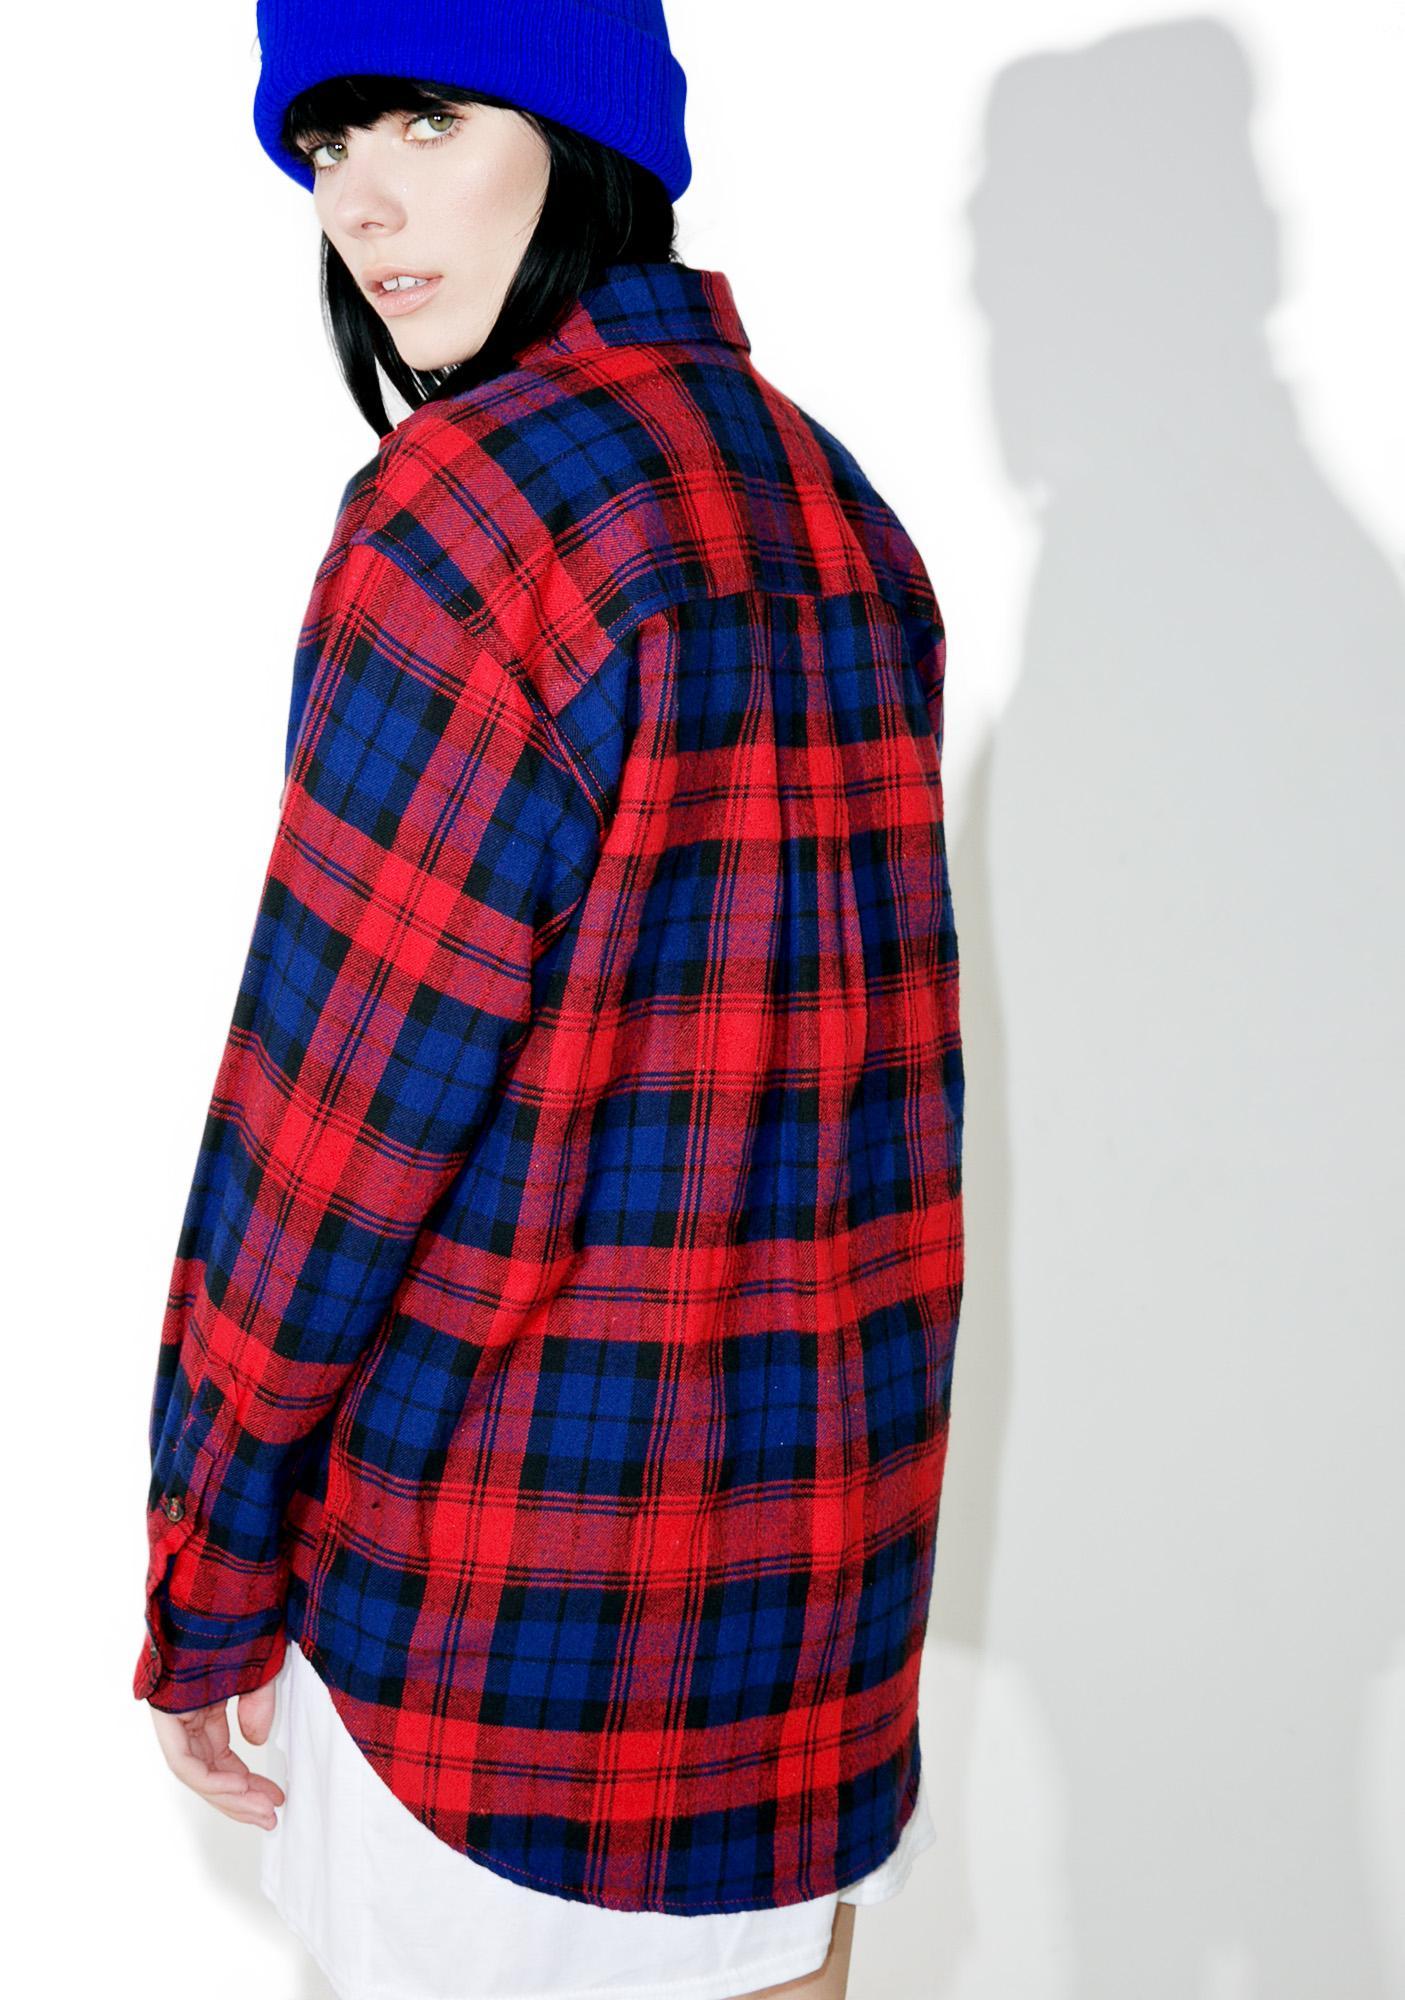 Polly Plaid Shirt